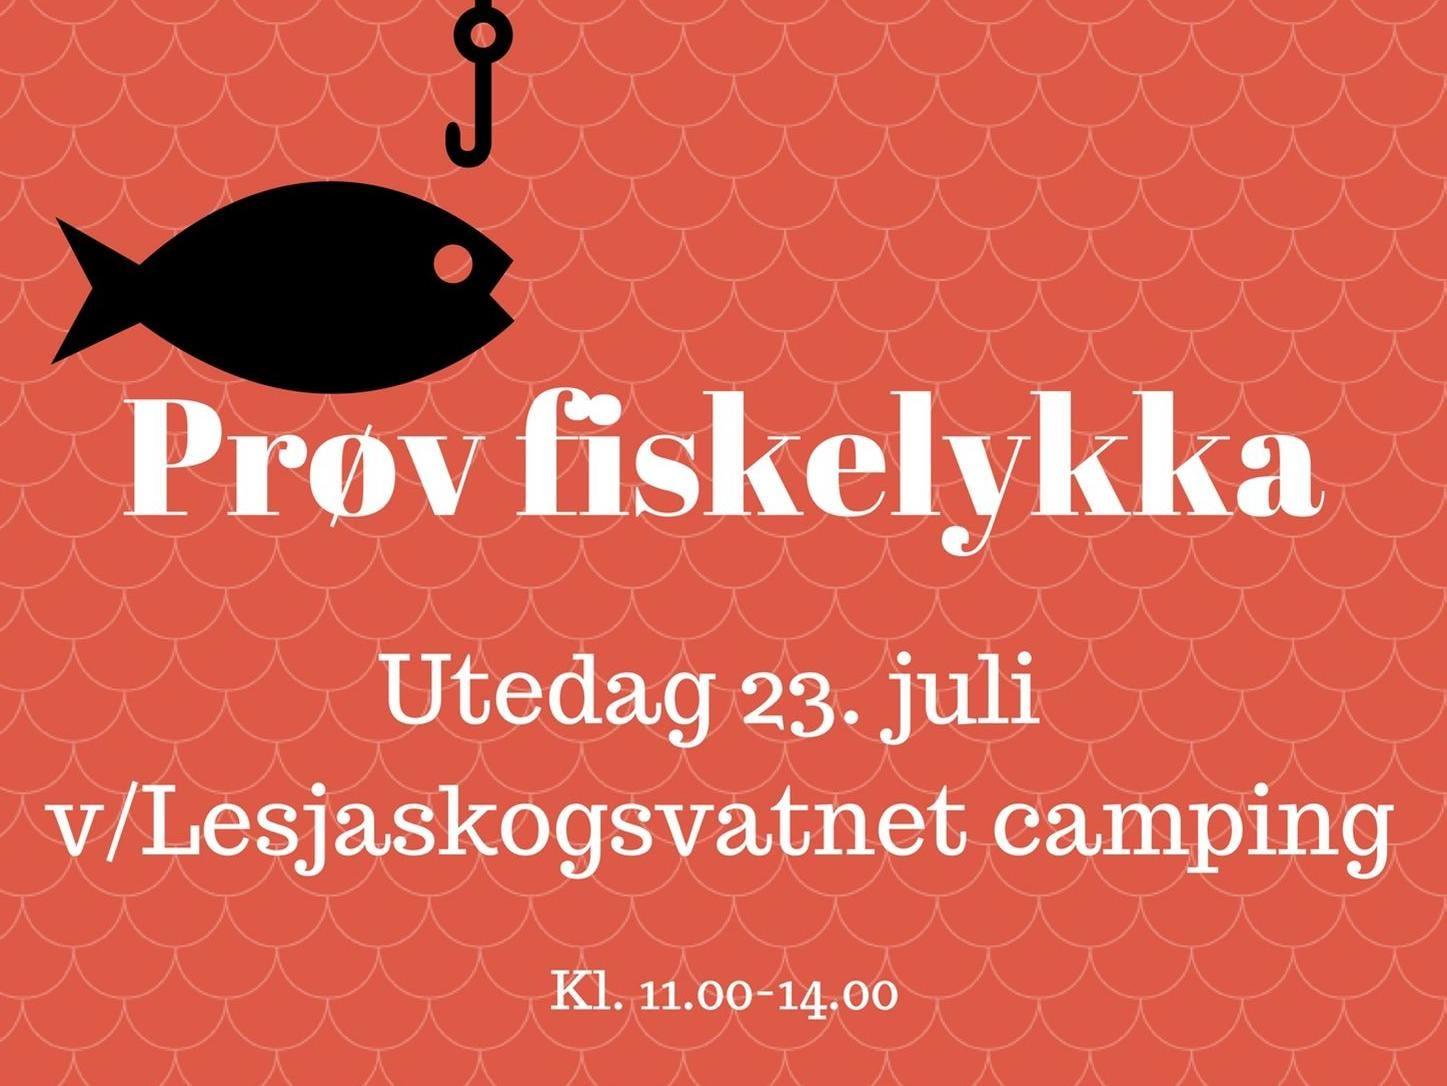 Prøv fiskelykka på Lesjaskog